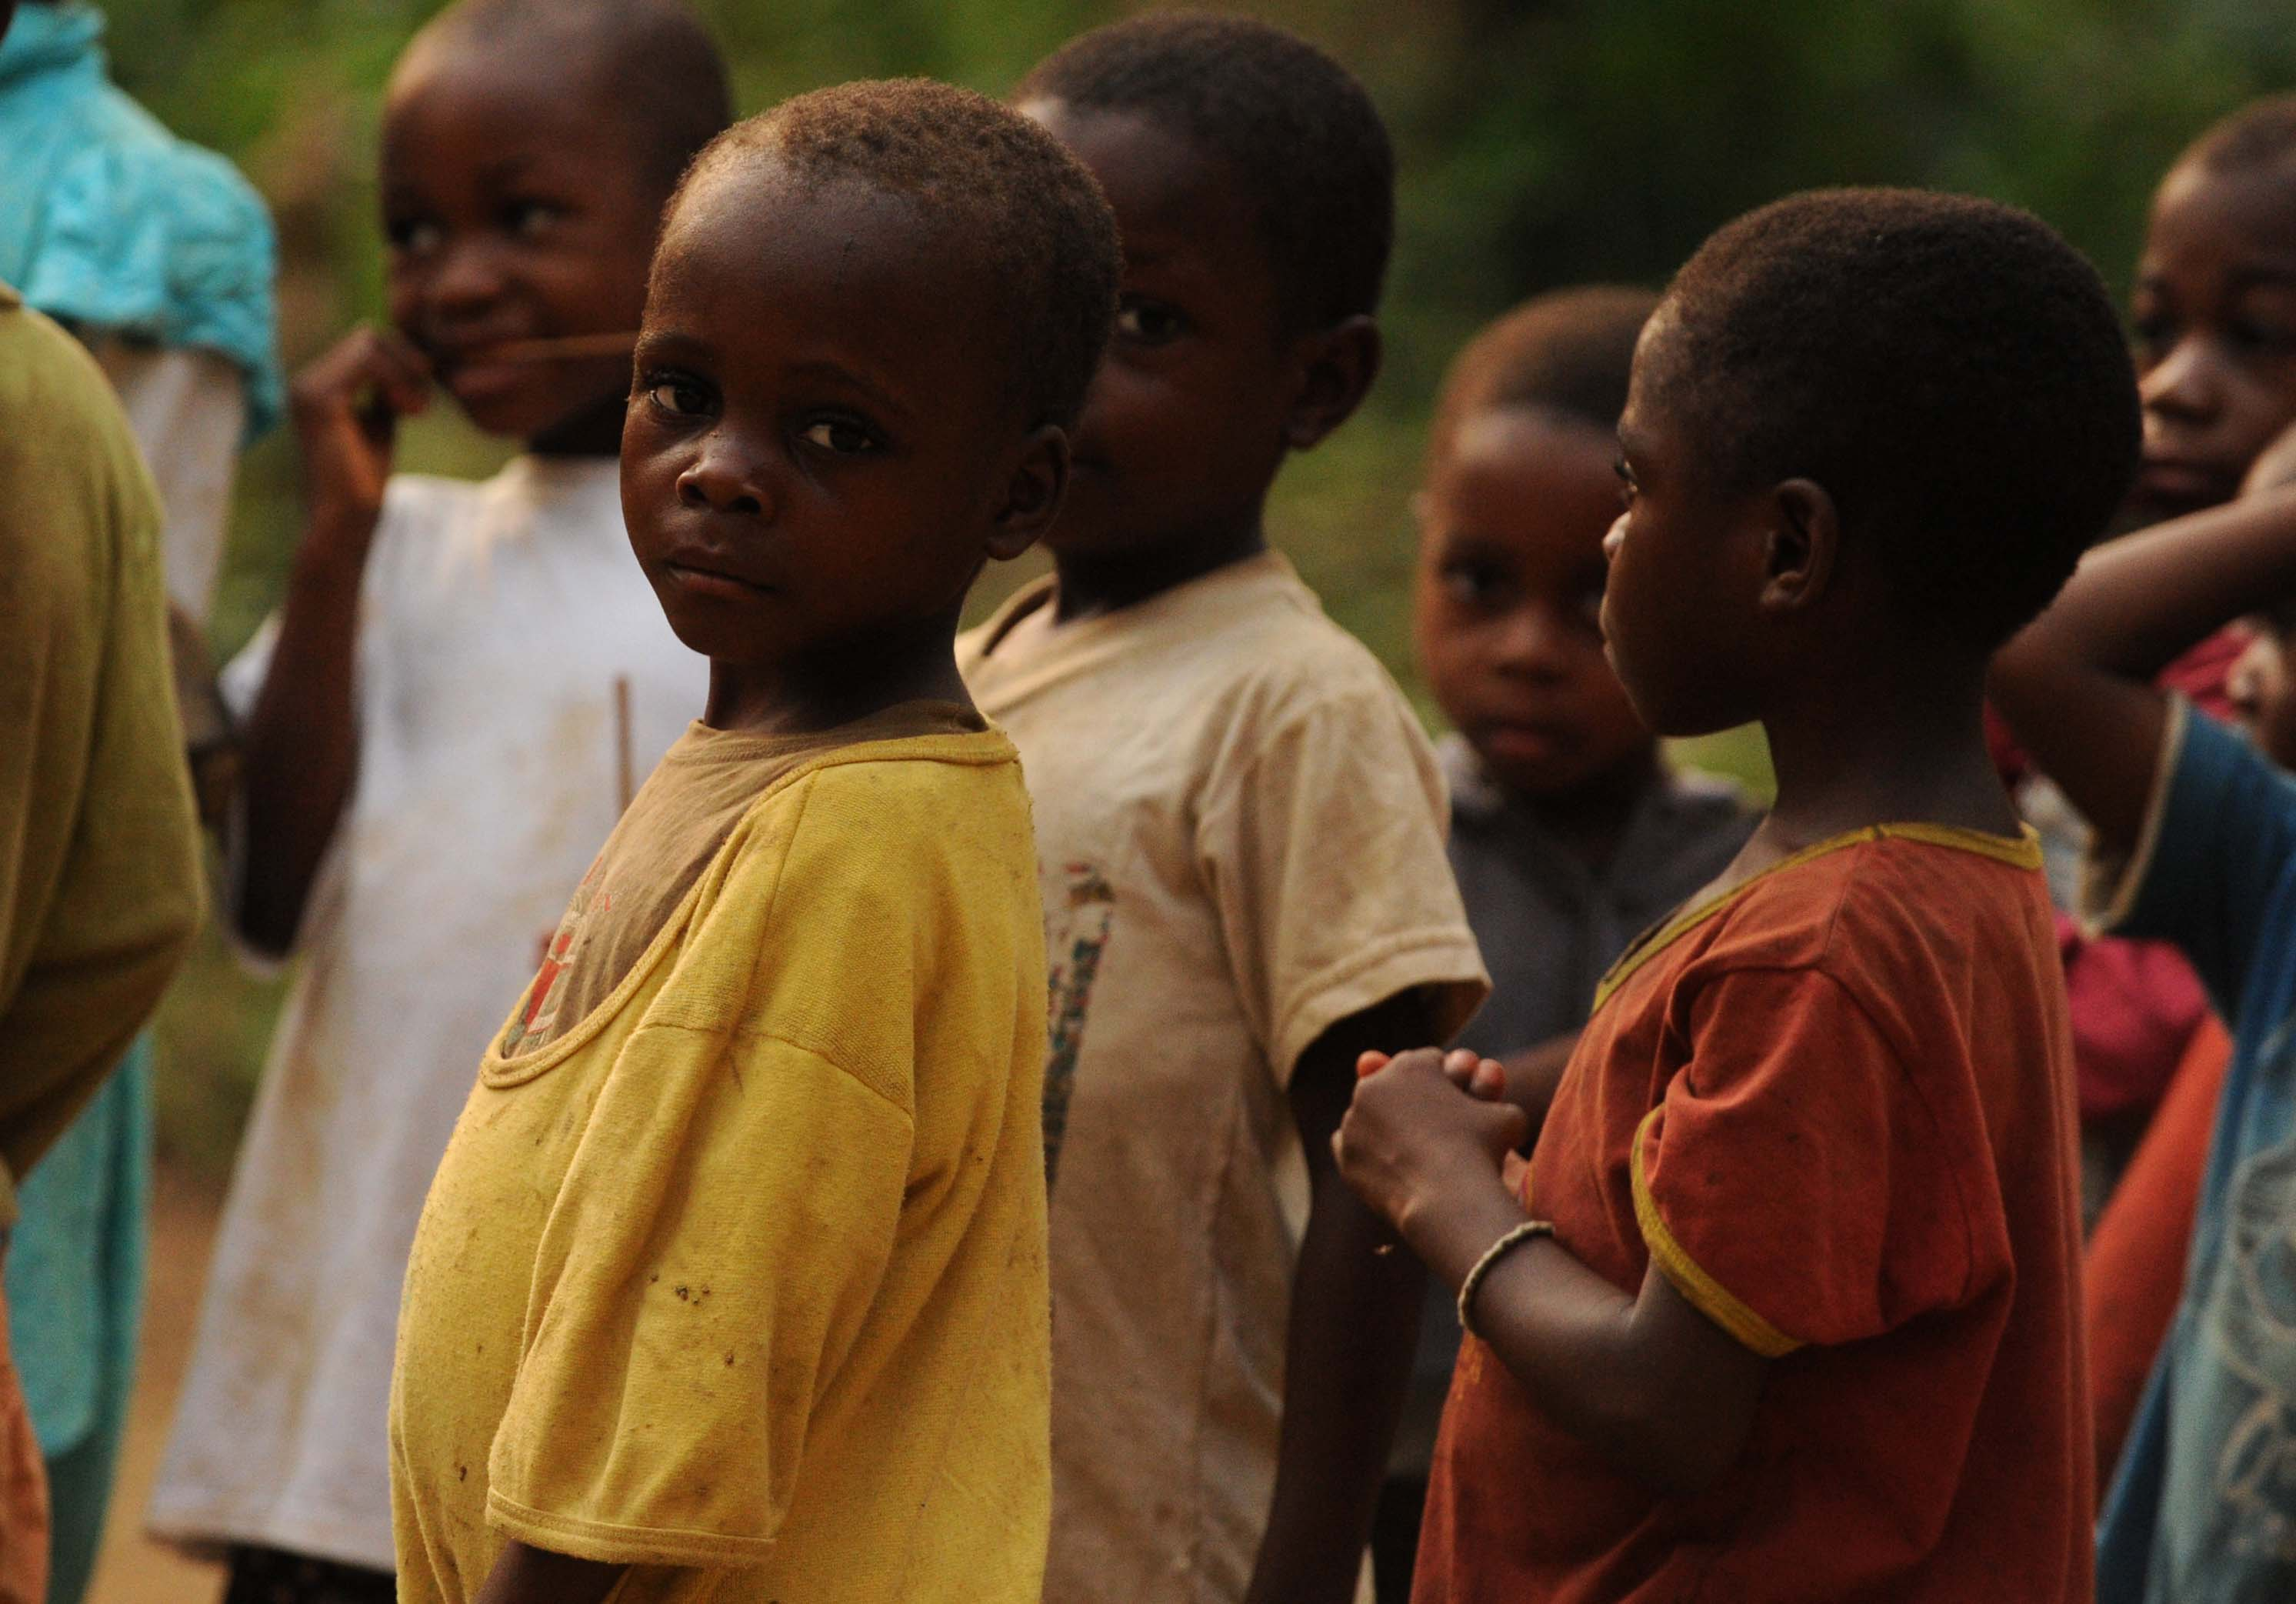 CAMEROON 058